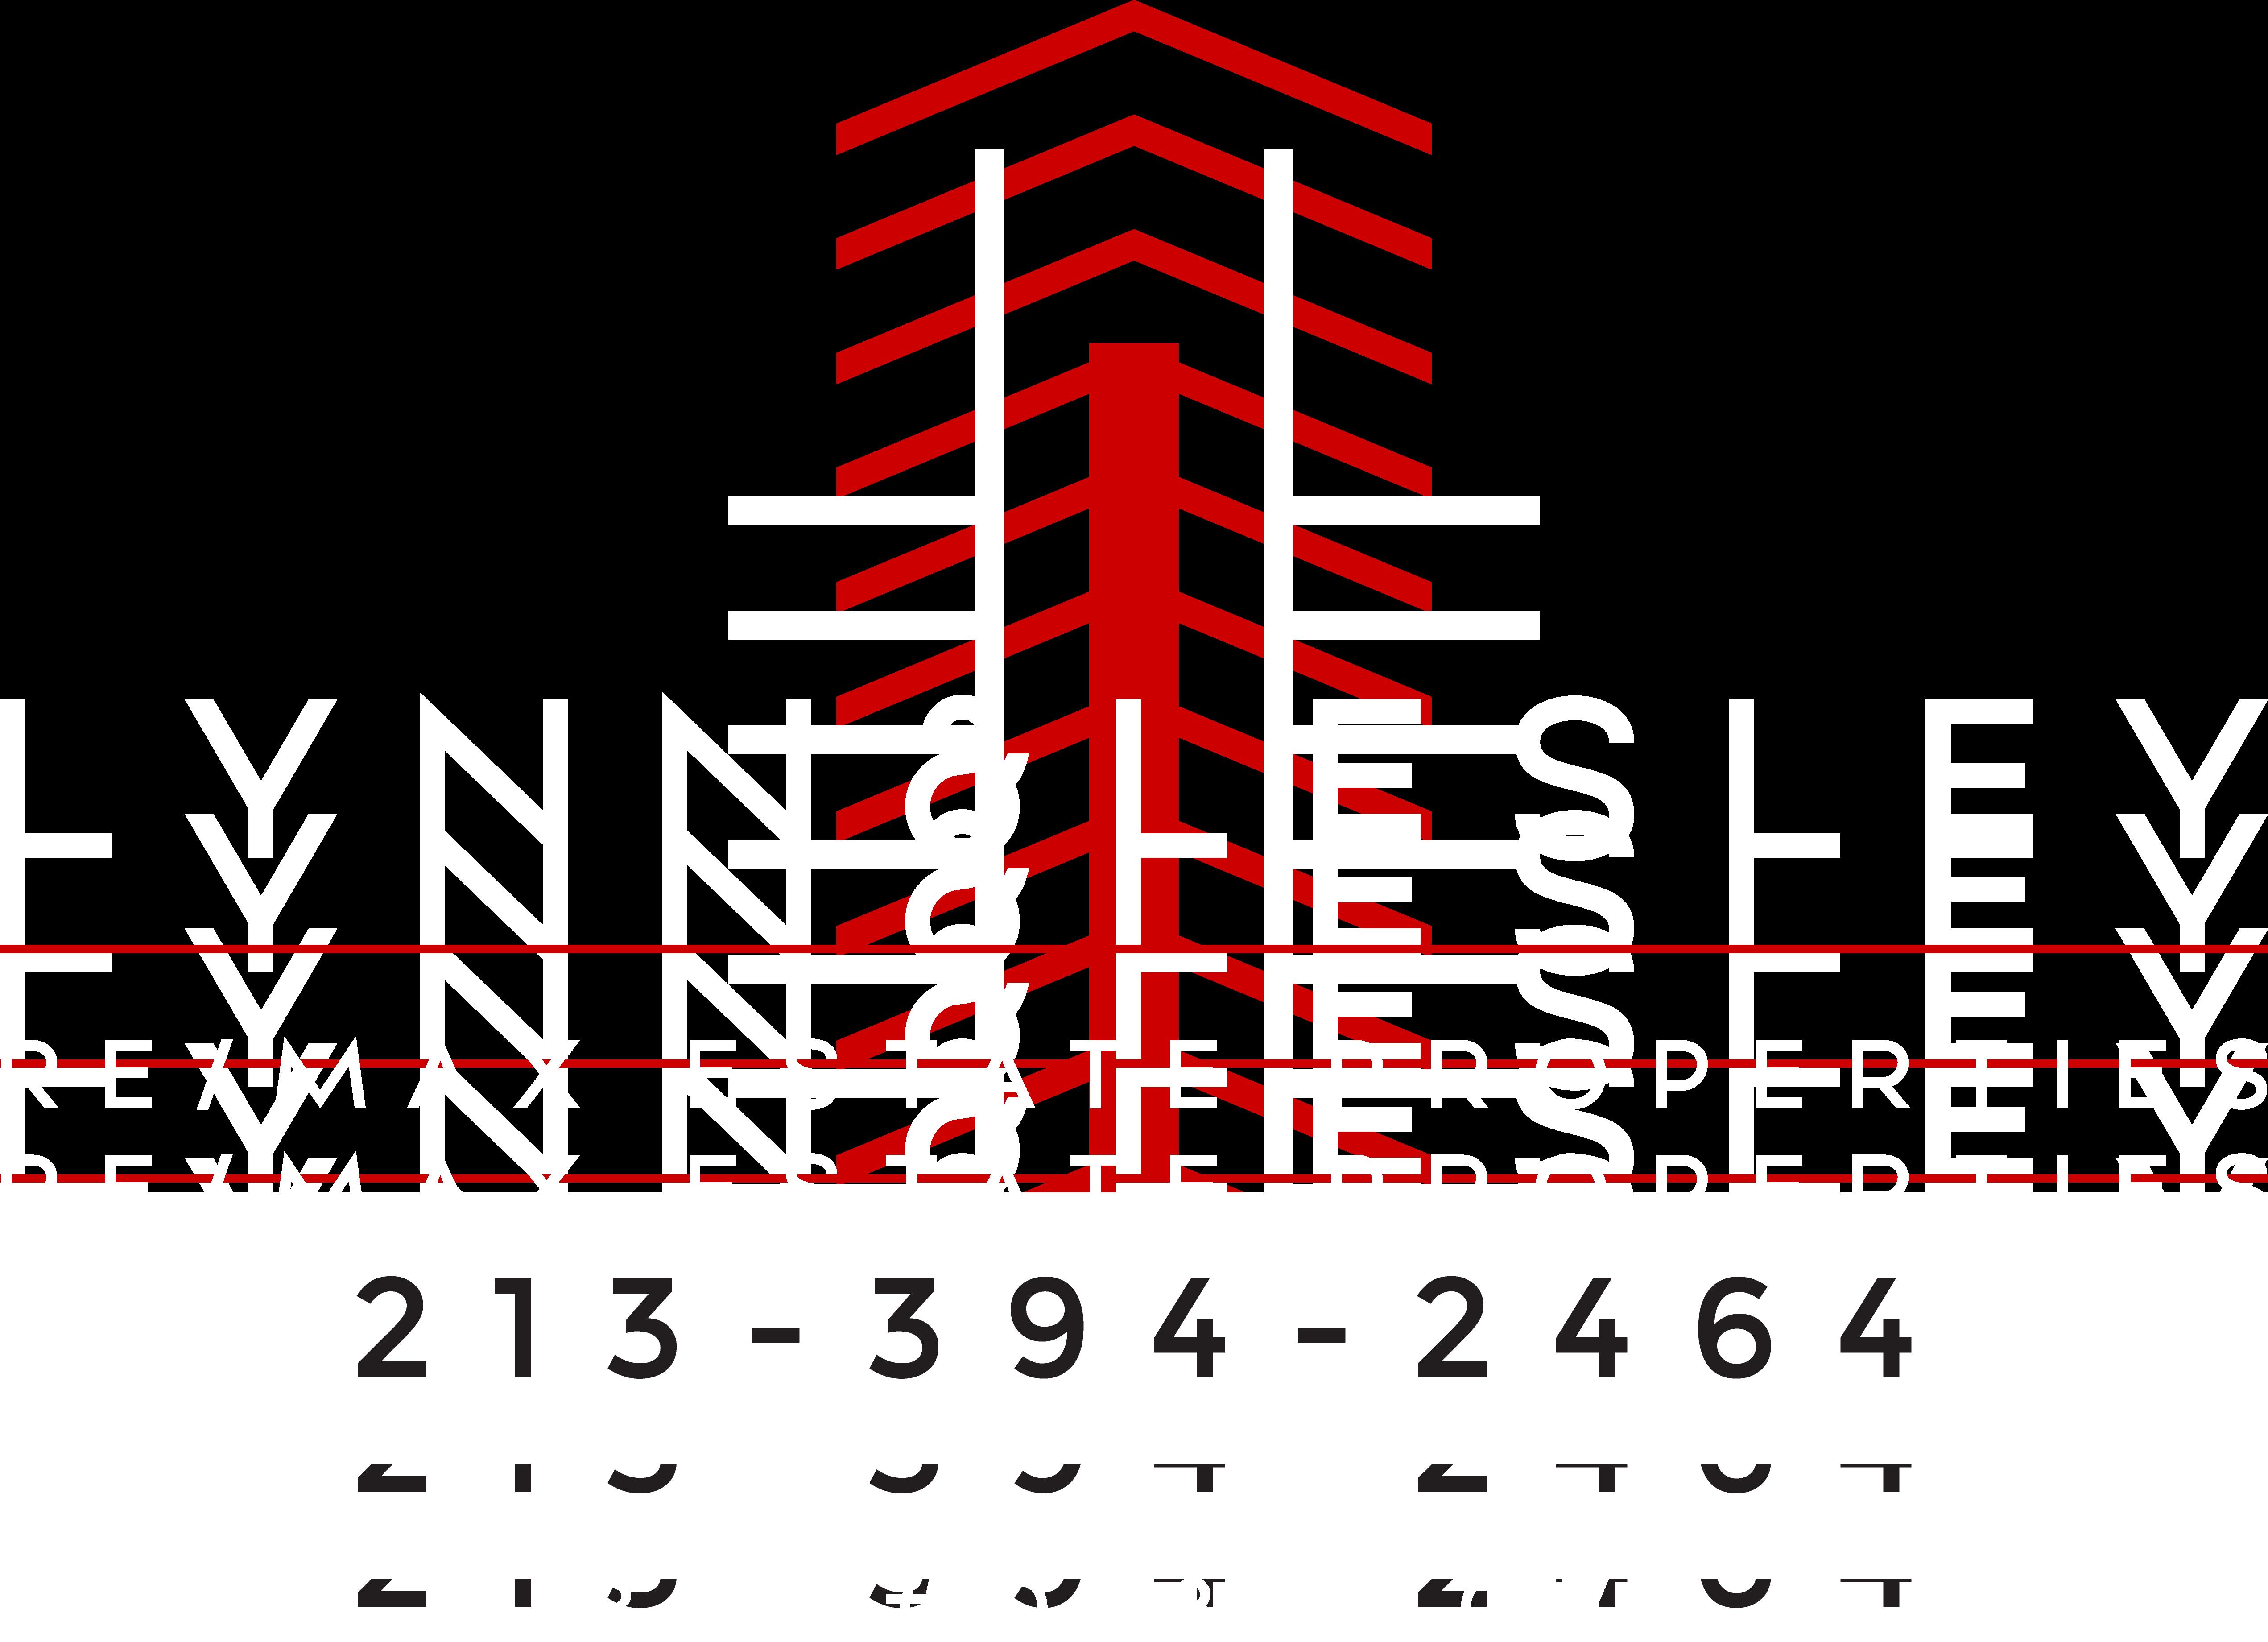 lynnandlesley_remax_logo_blackbg